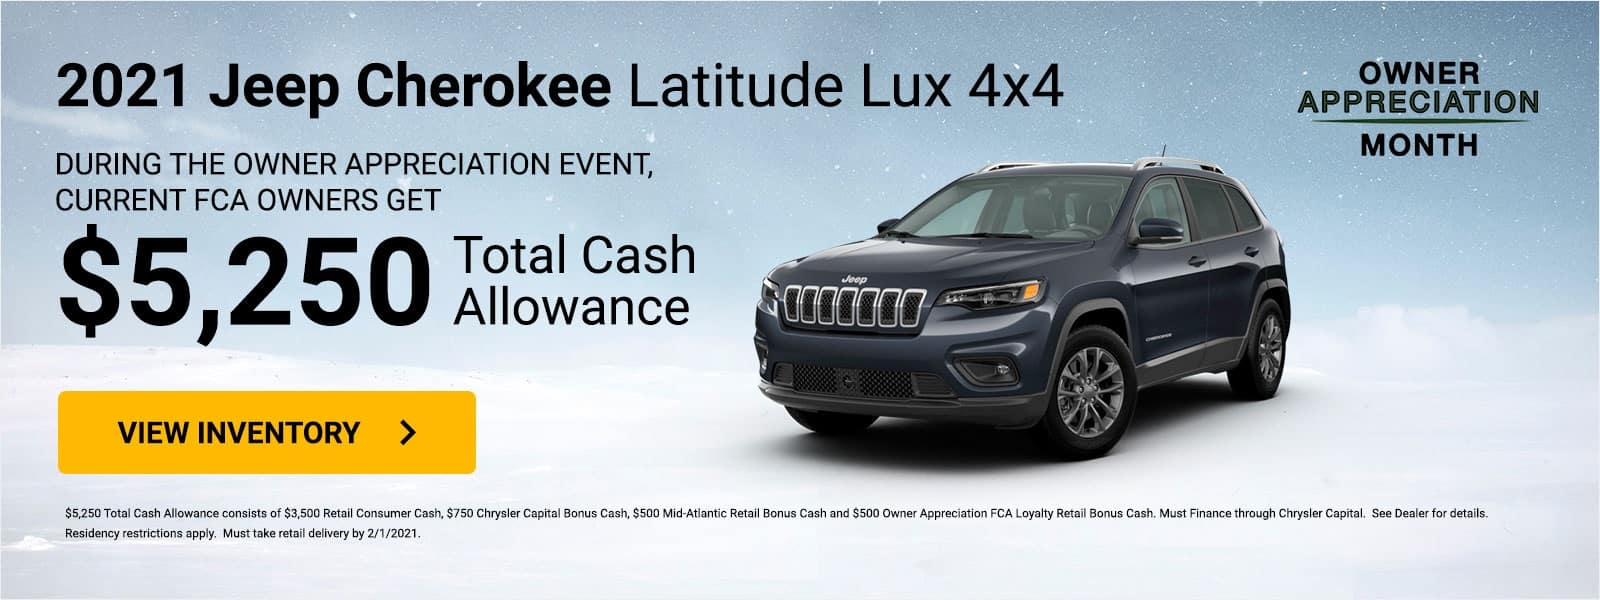 jeep-cherokee-latitude-lux-4×4 – RETAIL (All Markets) (3)